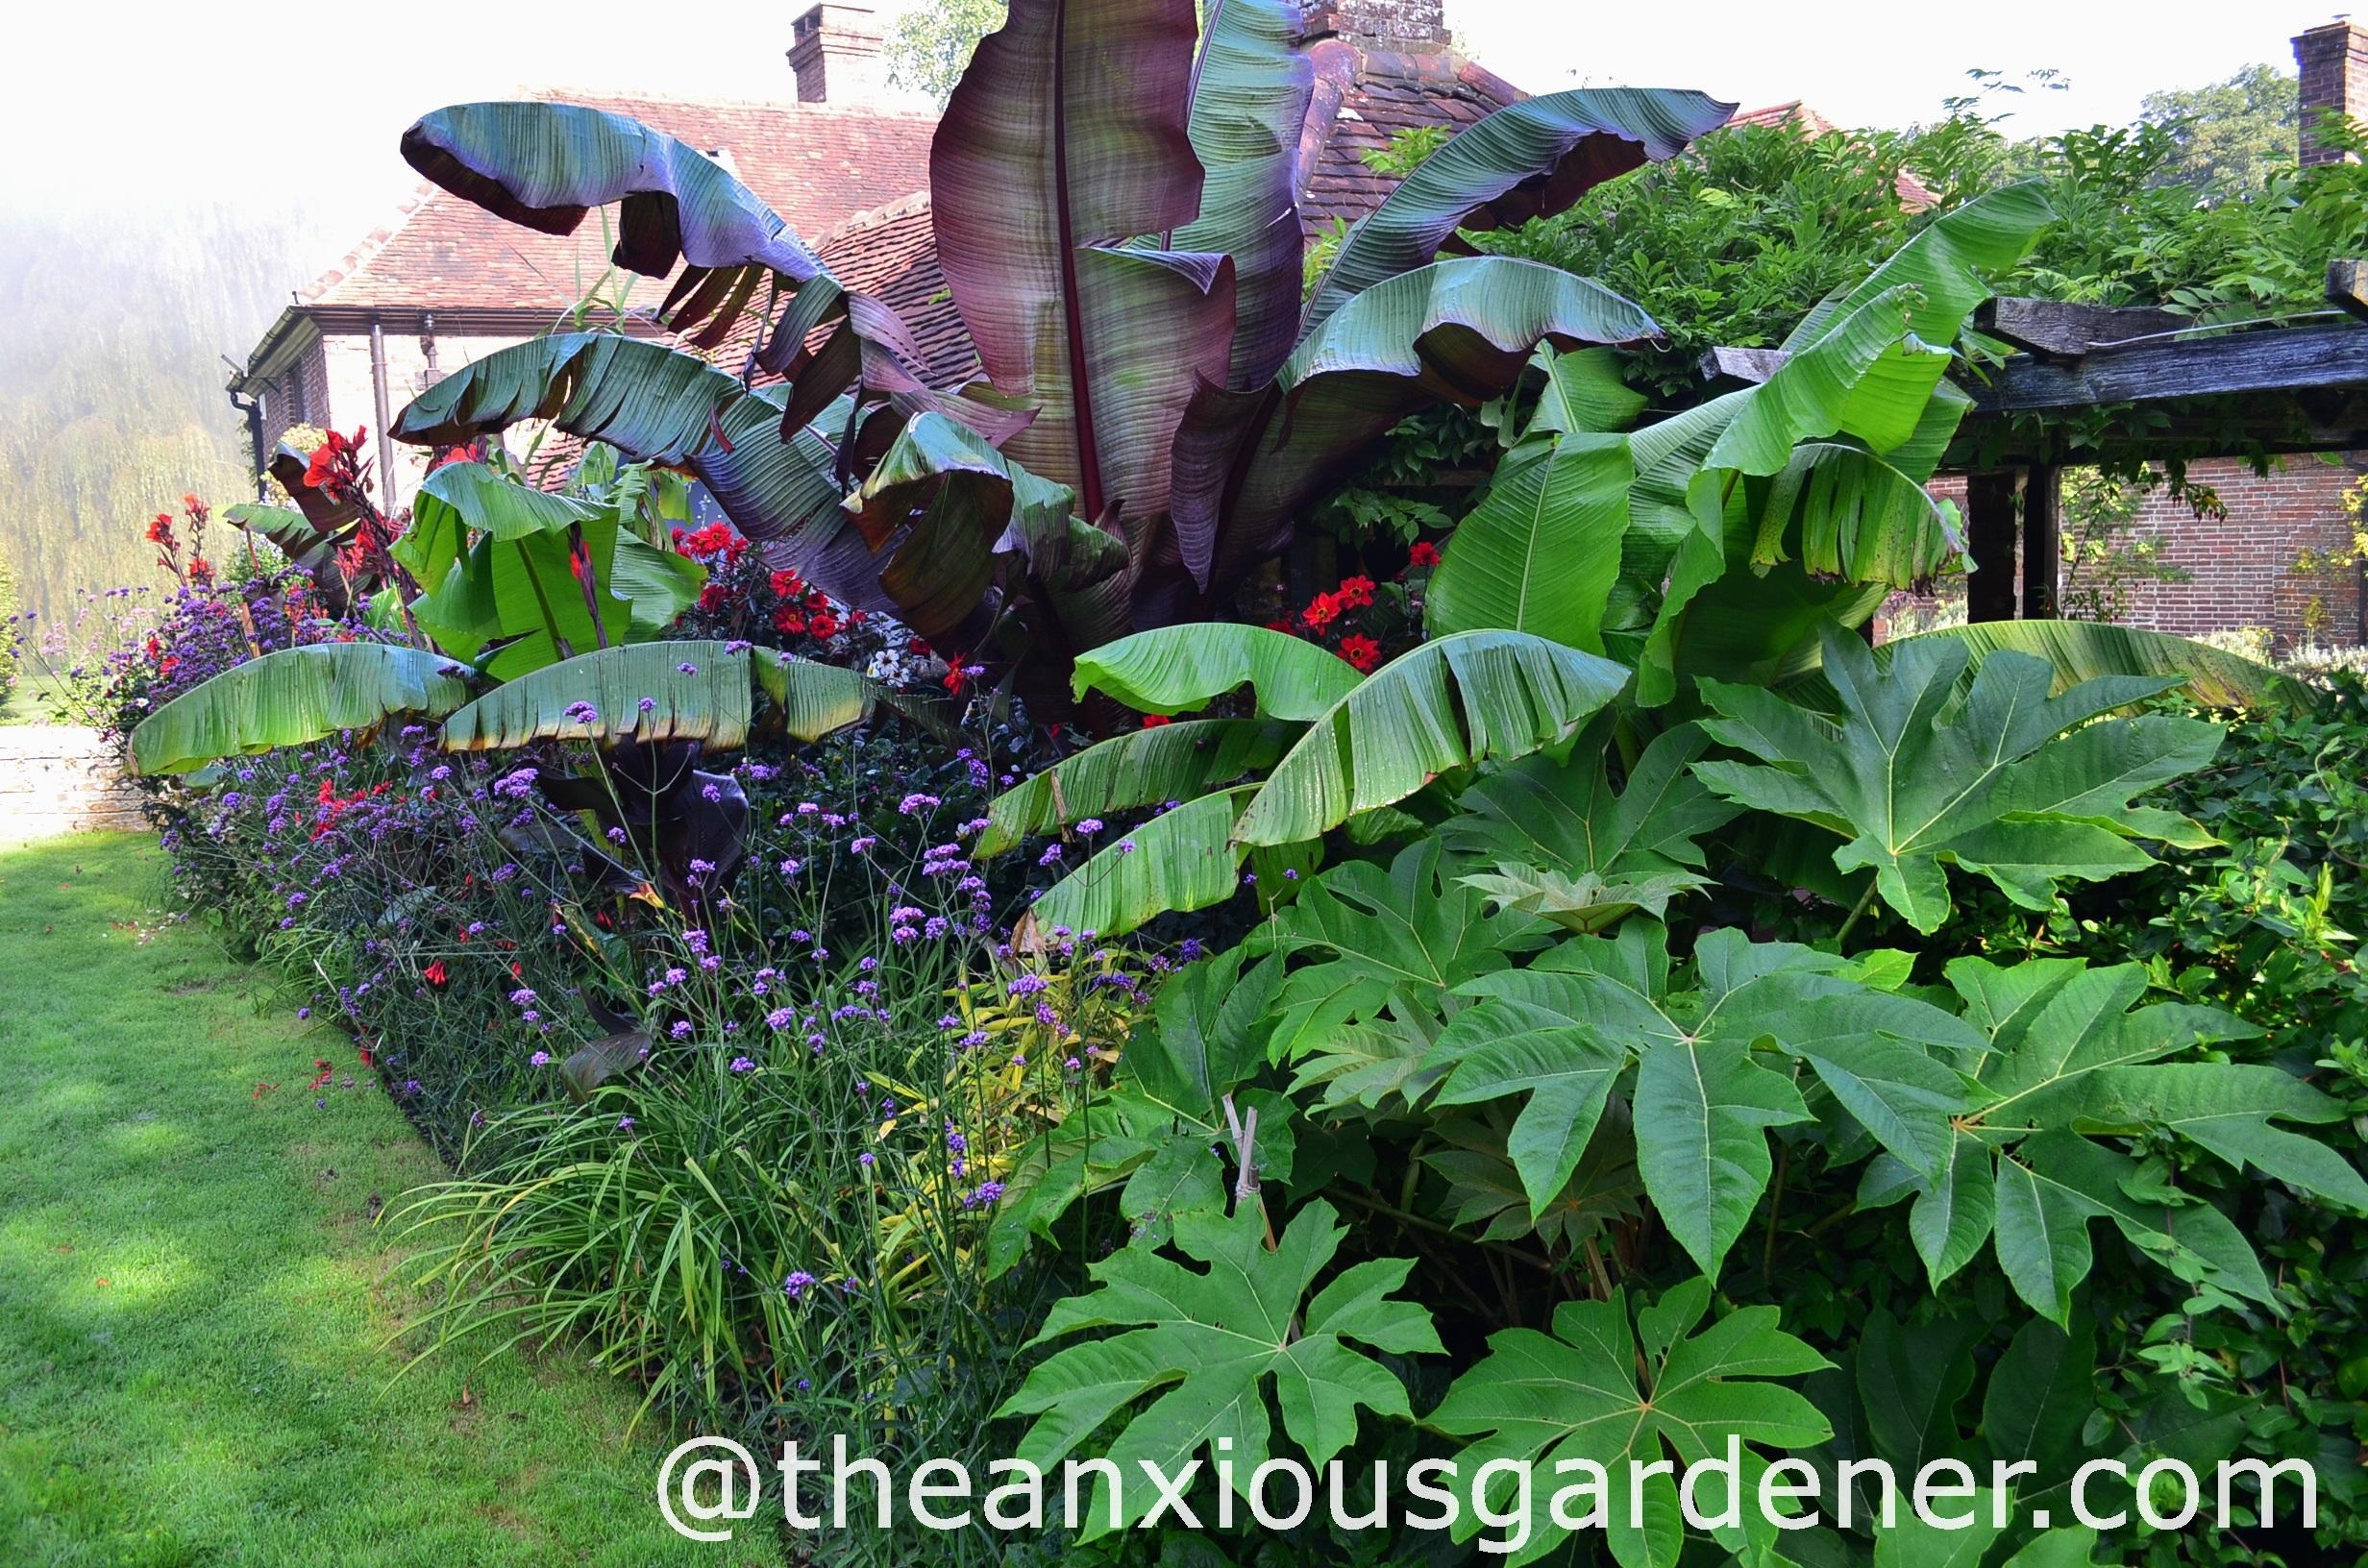 Ensete maurelii the anxious gardener - Hardy houseplants ...